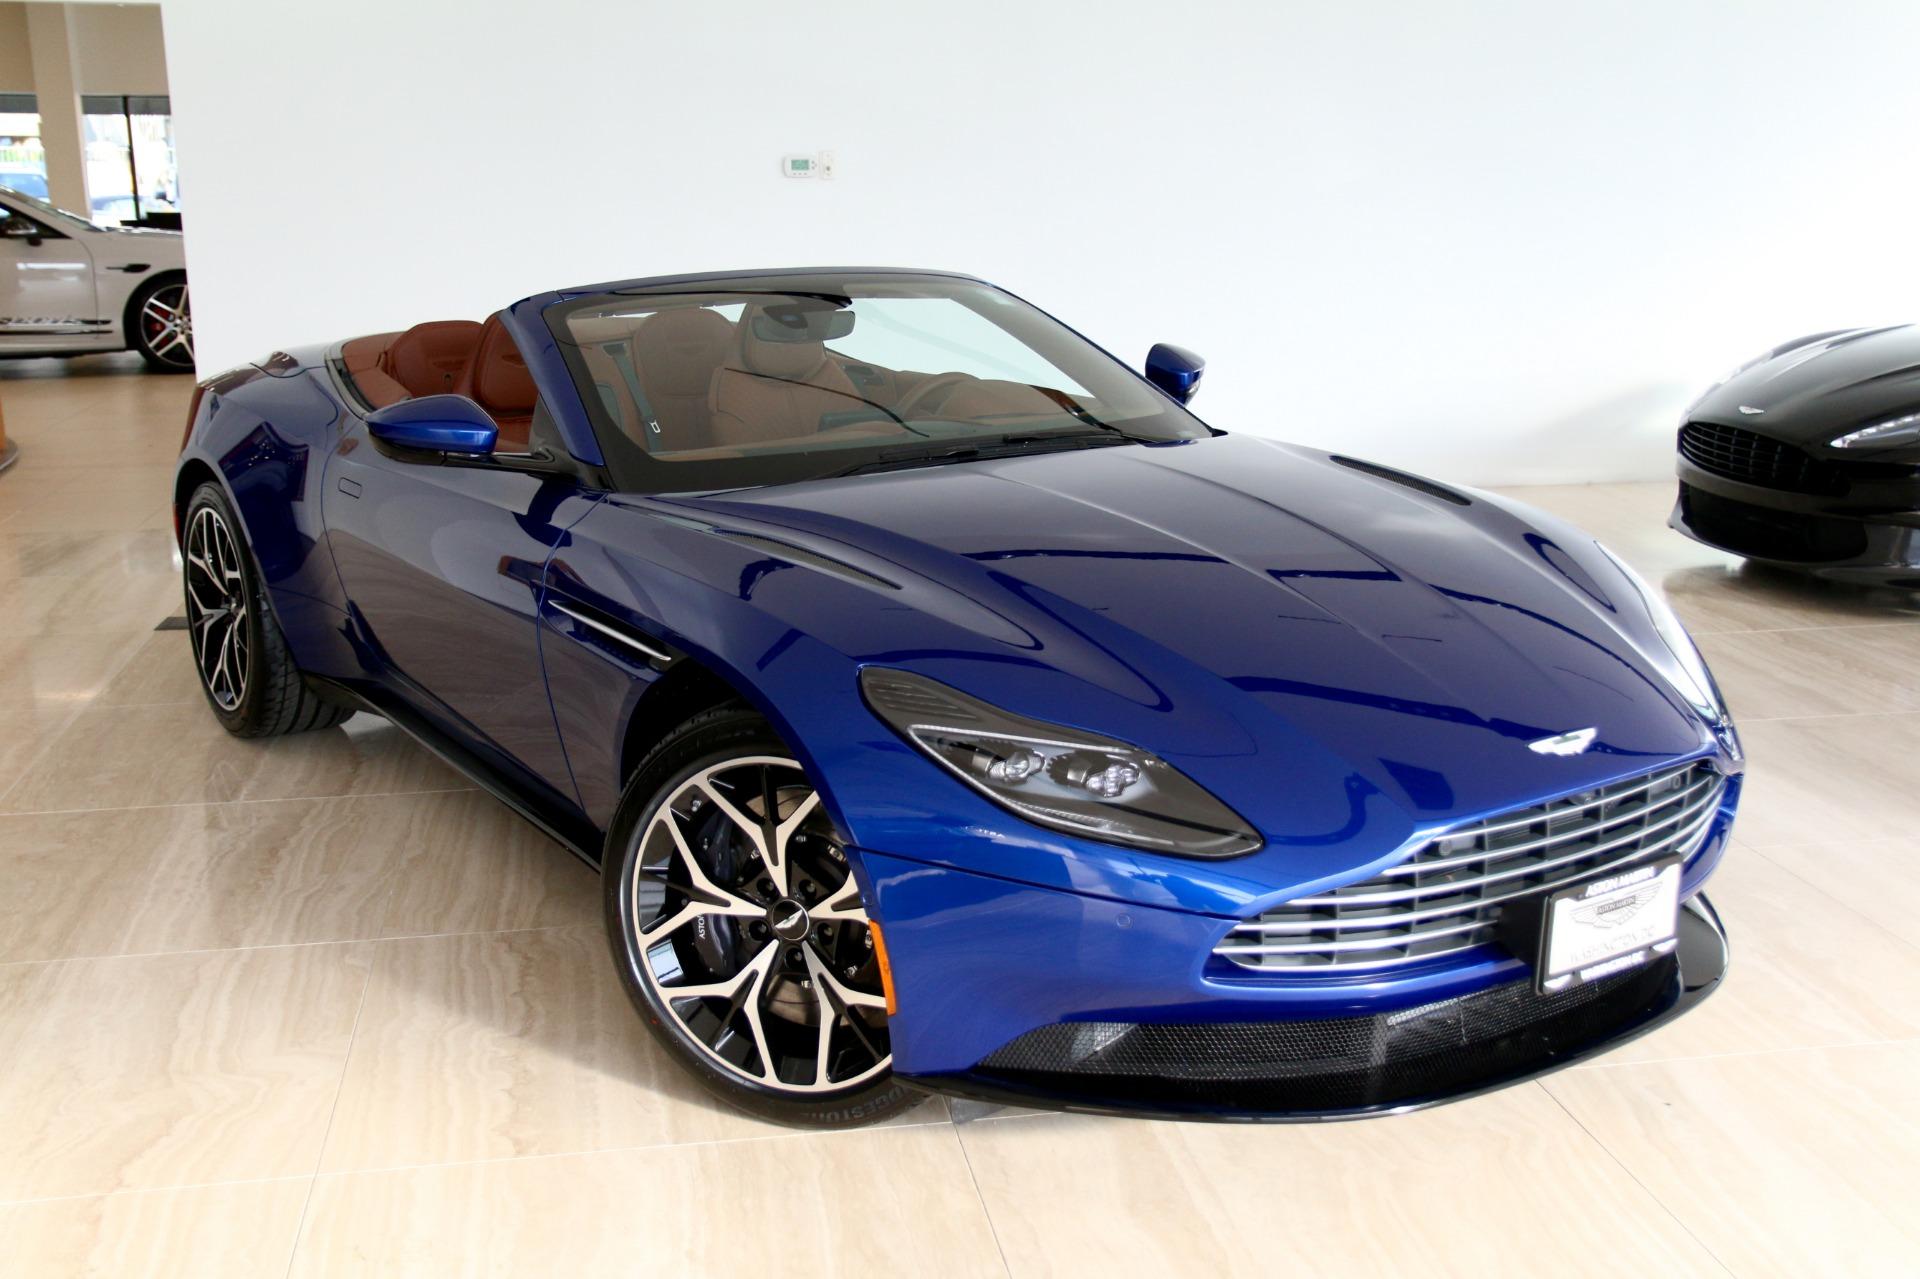 2019 Aston Martin Db11 Volante Stock 9nm05765 For Sale Near Vienna